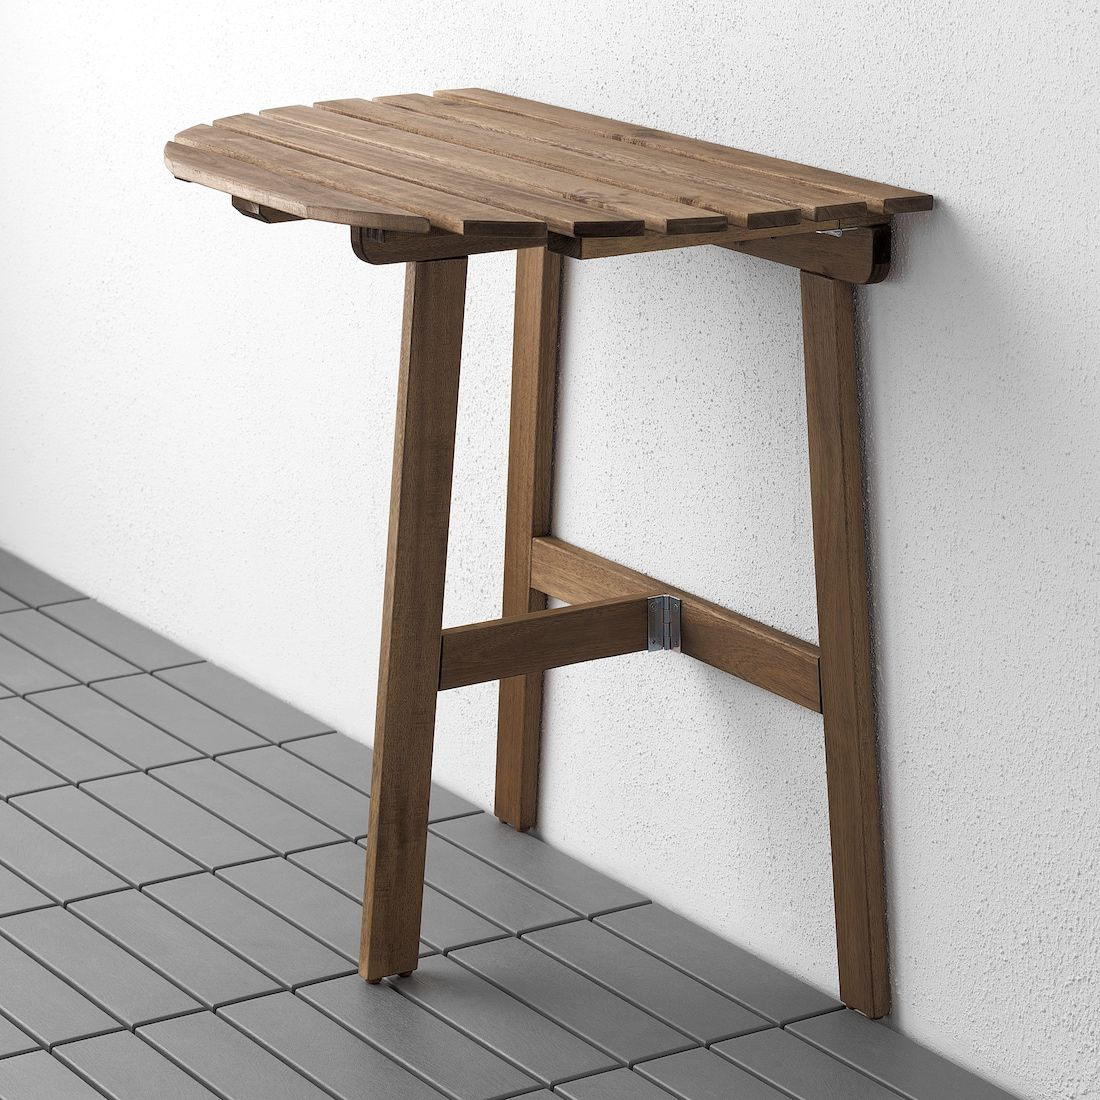 Askholmen Table For Wall Outdoor Folding Light Brown Stained Light Brown Gray Brown Stained Ikea In 2020 Wandtisch Ikea Klapptisch Holzbeize